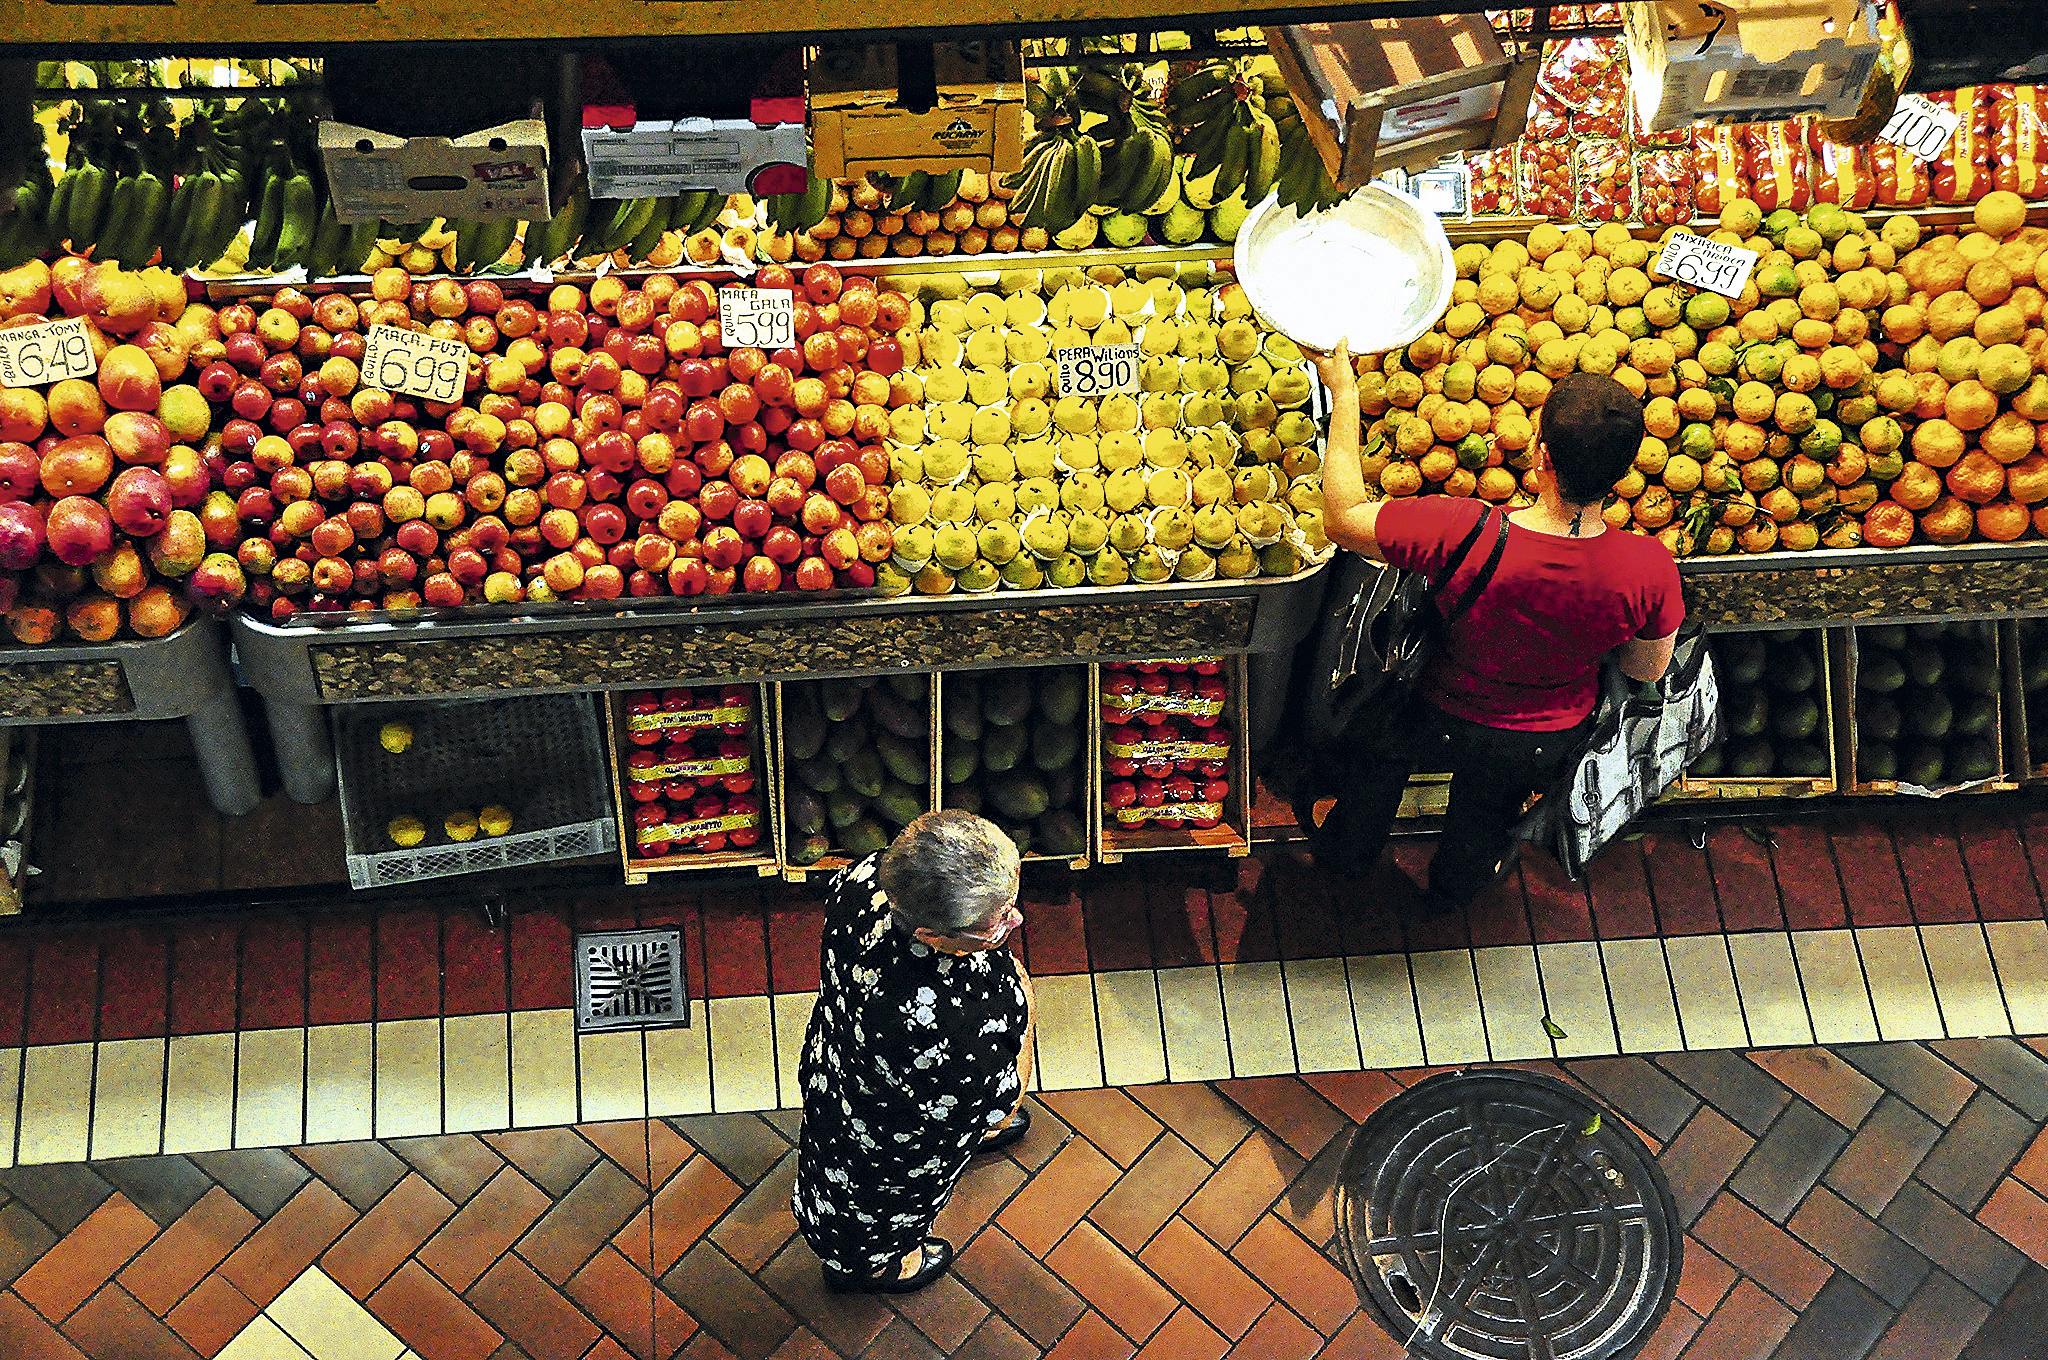 Mercado Central de Belo Horizonte, Minas Gerais, Brasil